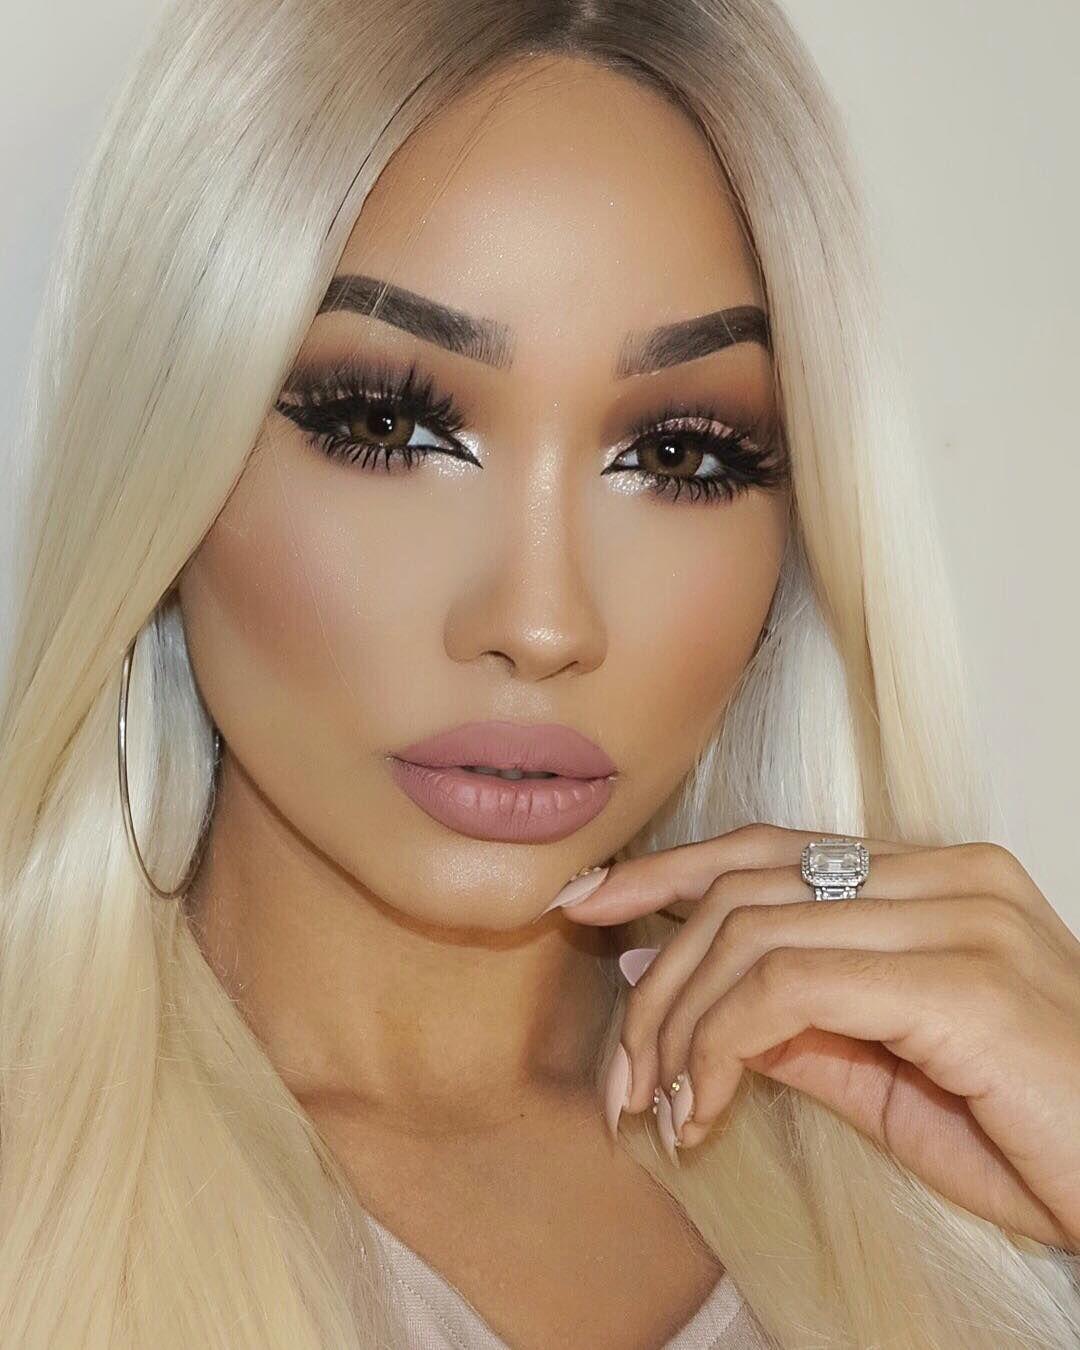 Blonde Hair Light Brown Eyes Makeup And Nails Pinterest Makeup